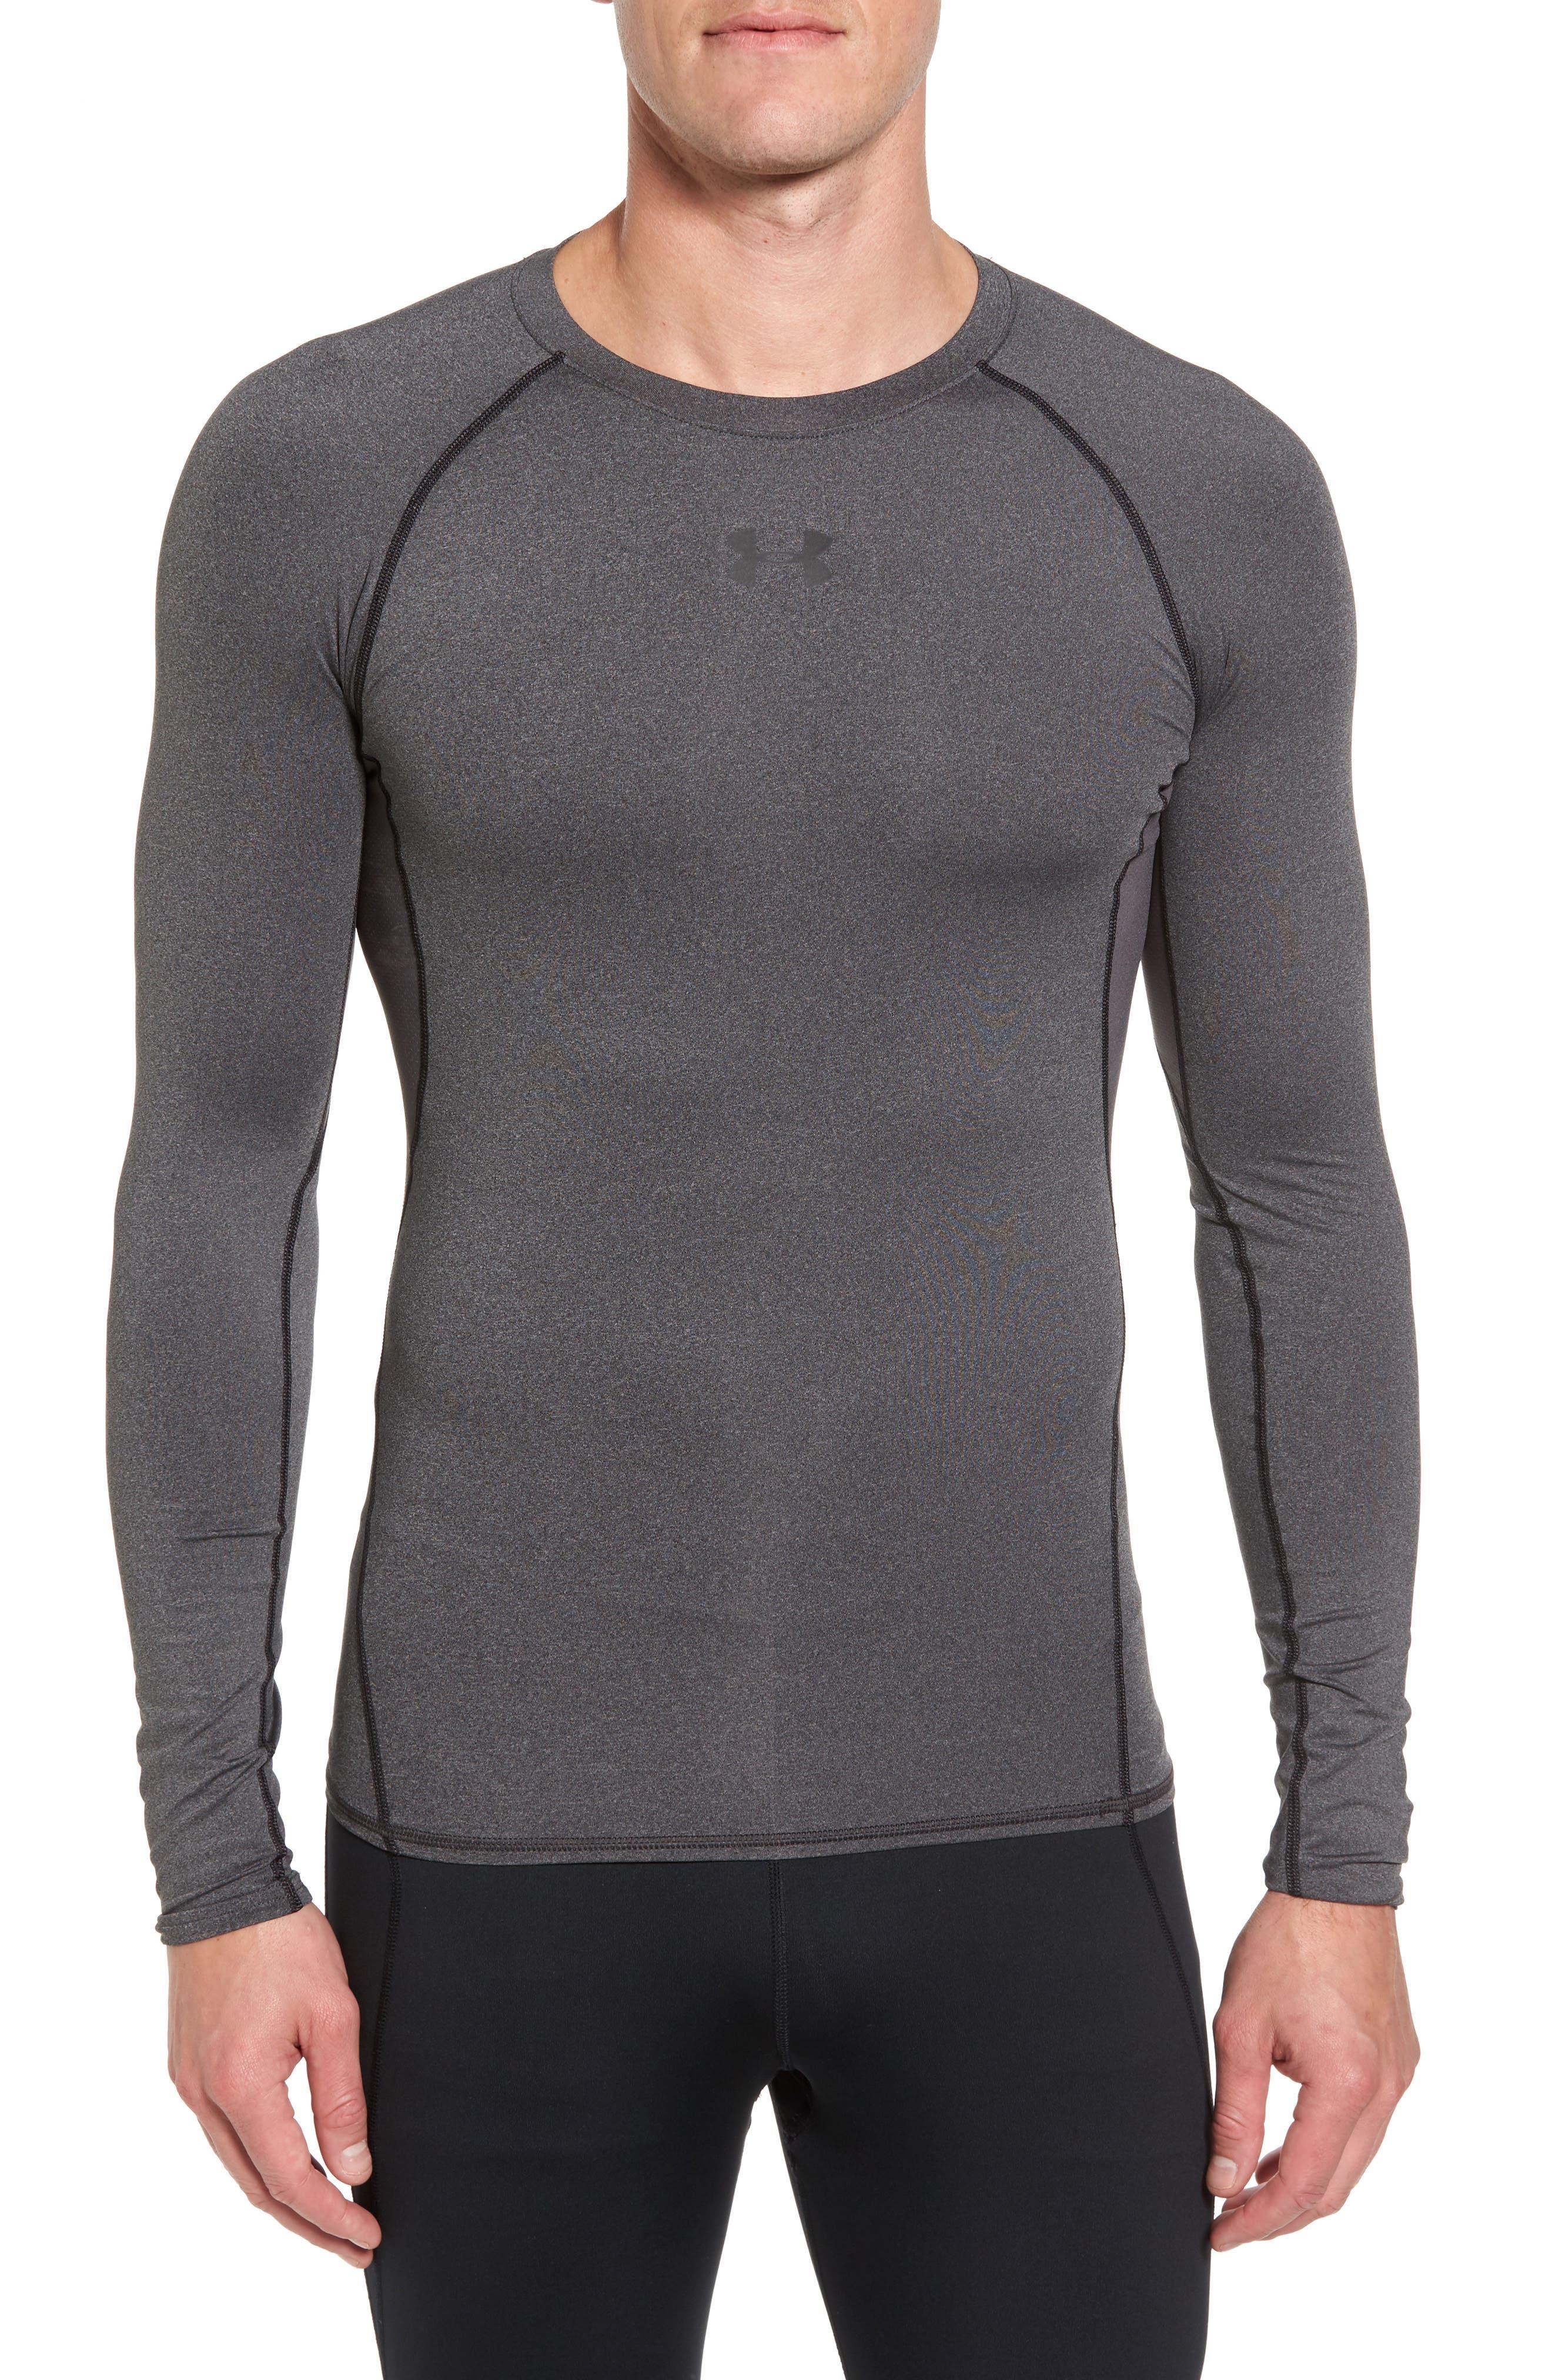 HeatGear<sup>®</sup> Compression Fit Long Sleeve T-Shirt,                         Main,                         color, CARBON HEATHER/ BLACK